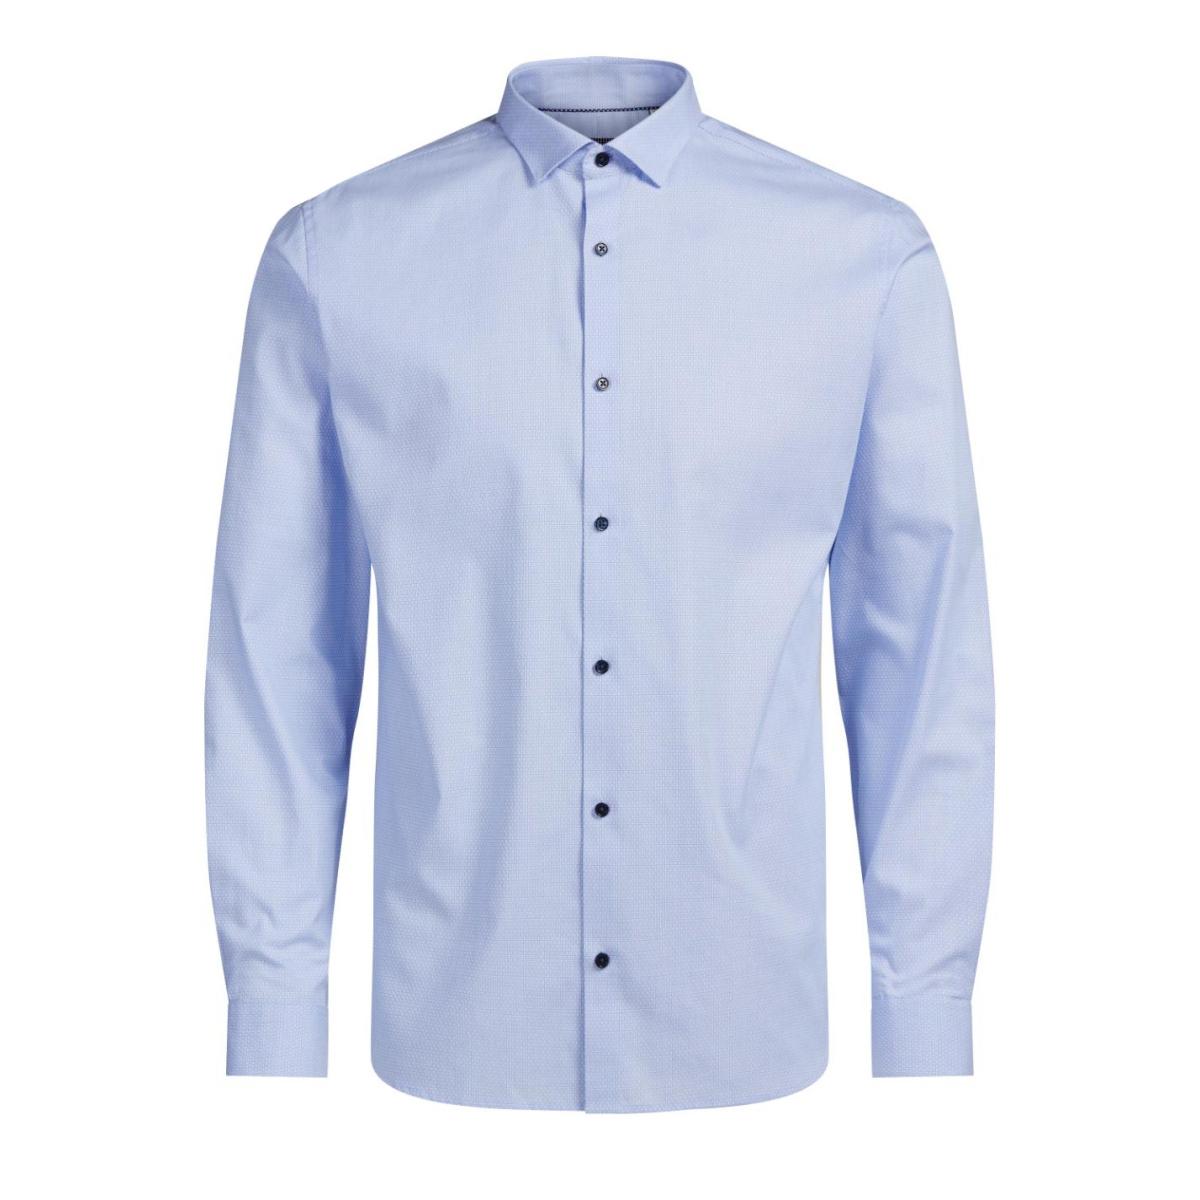 jprjenson shirt l/s noos 12125174 jack & jones overhemd cashmere blue